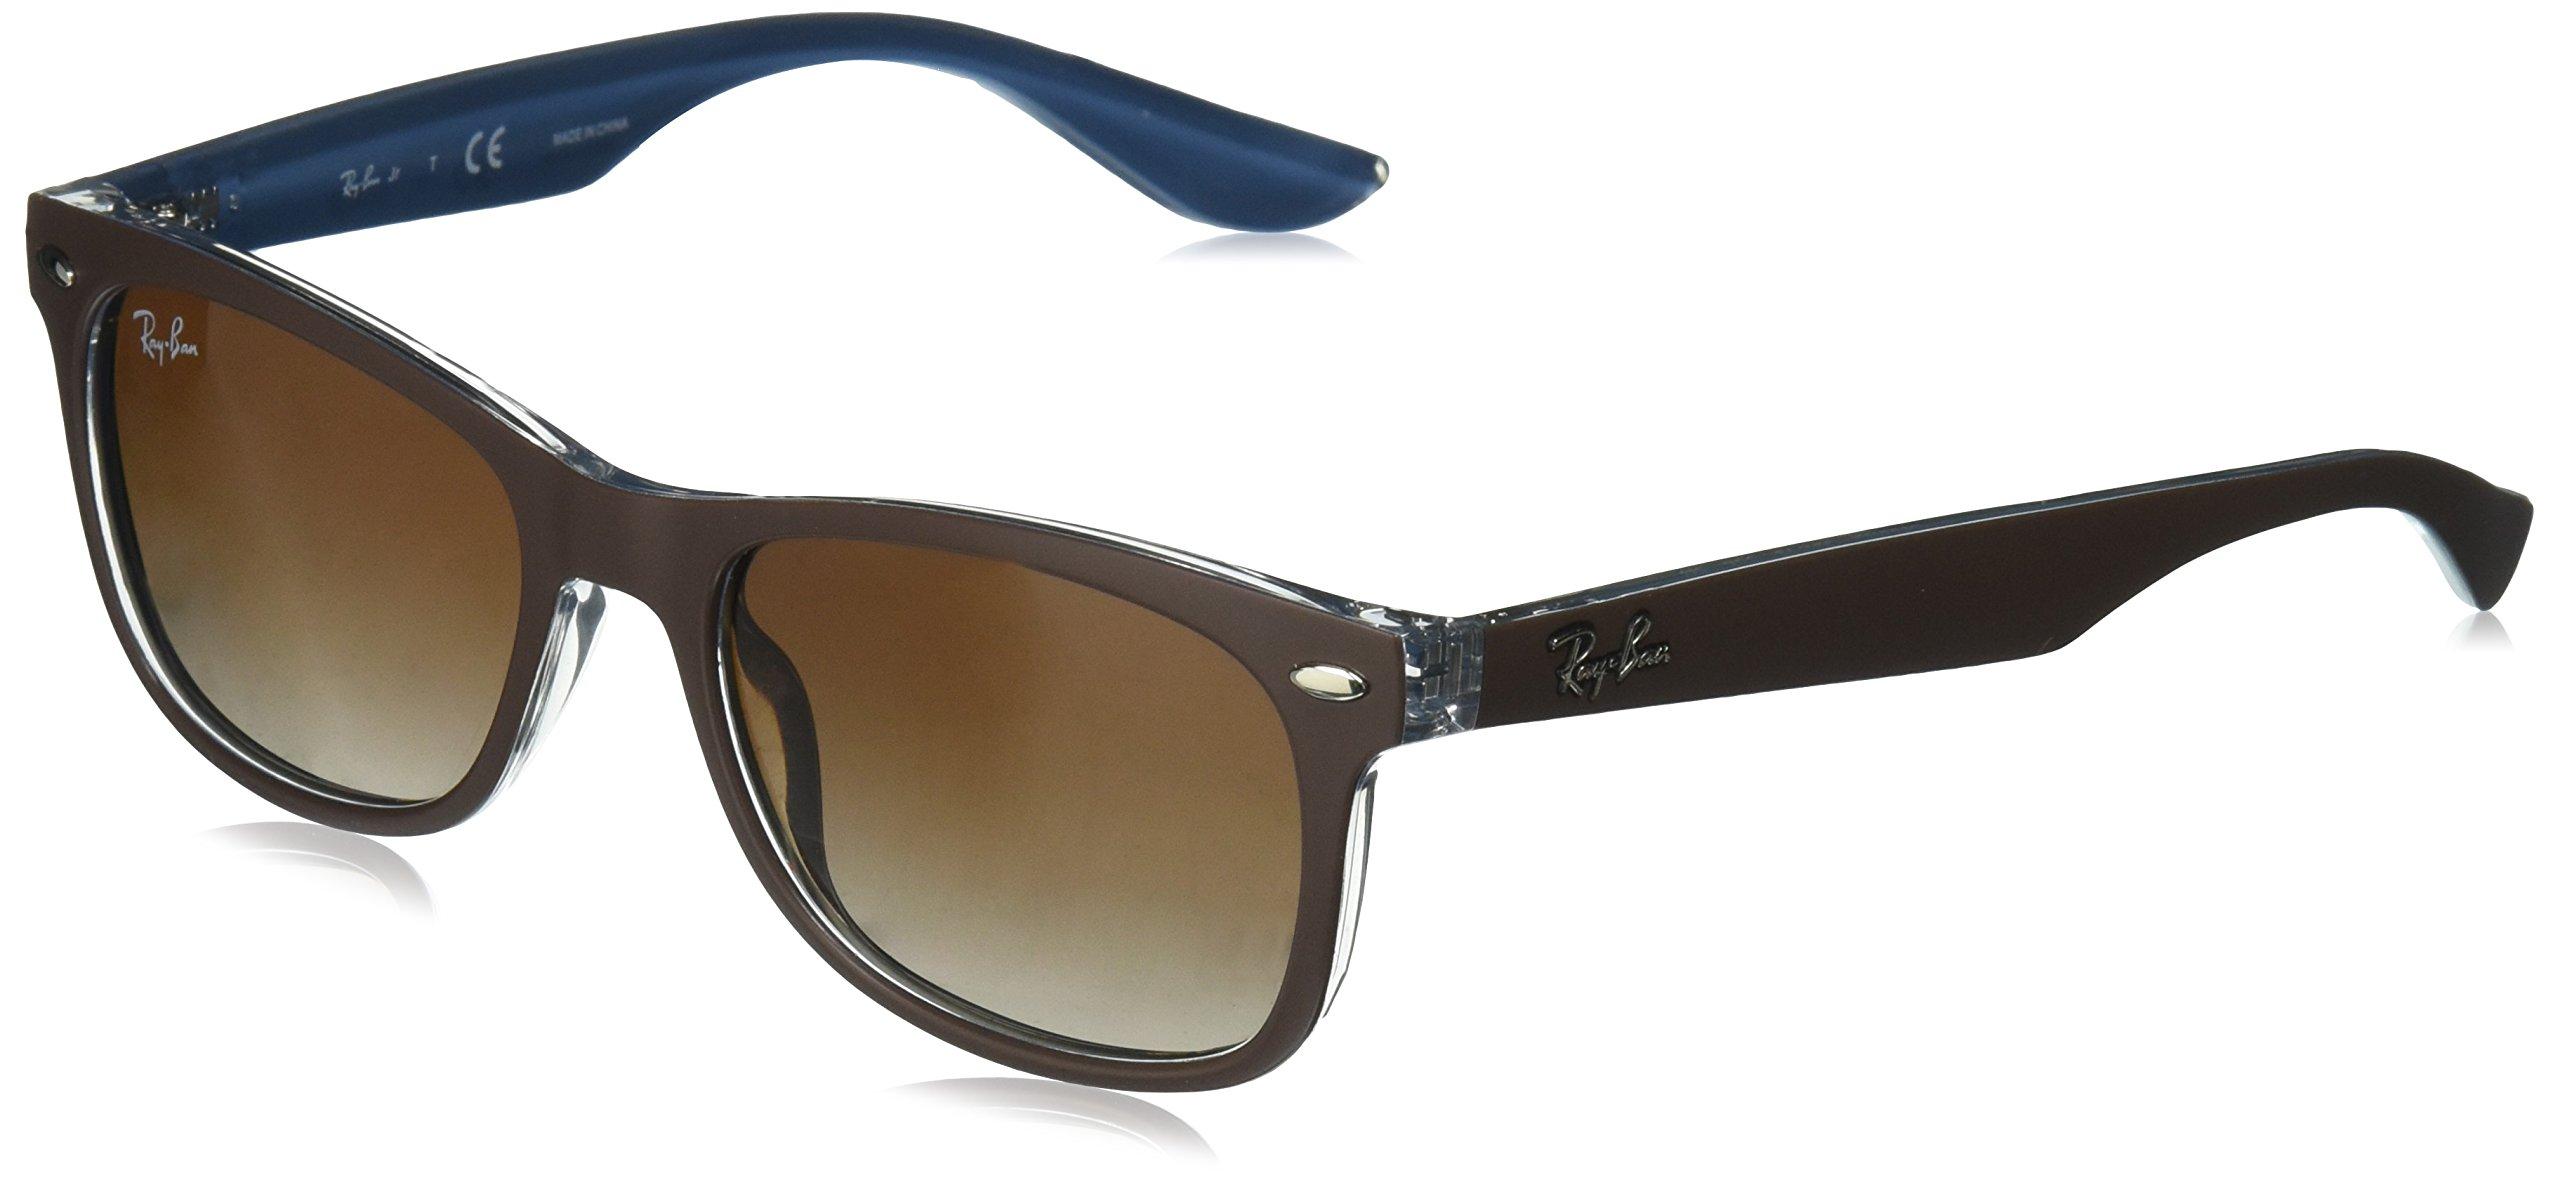 Ray-Ban Kids' RJ9052S 703513 Sunglasses, Top Matte Brown on Blue, 48mm